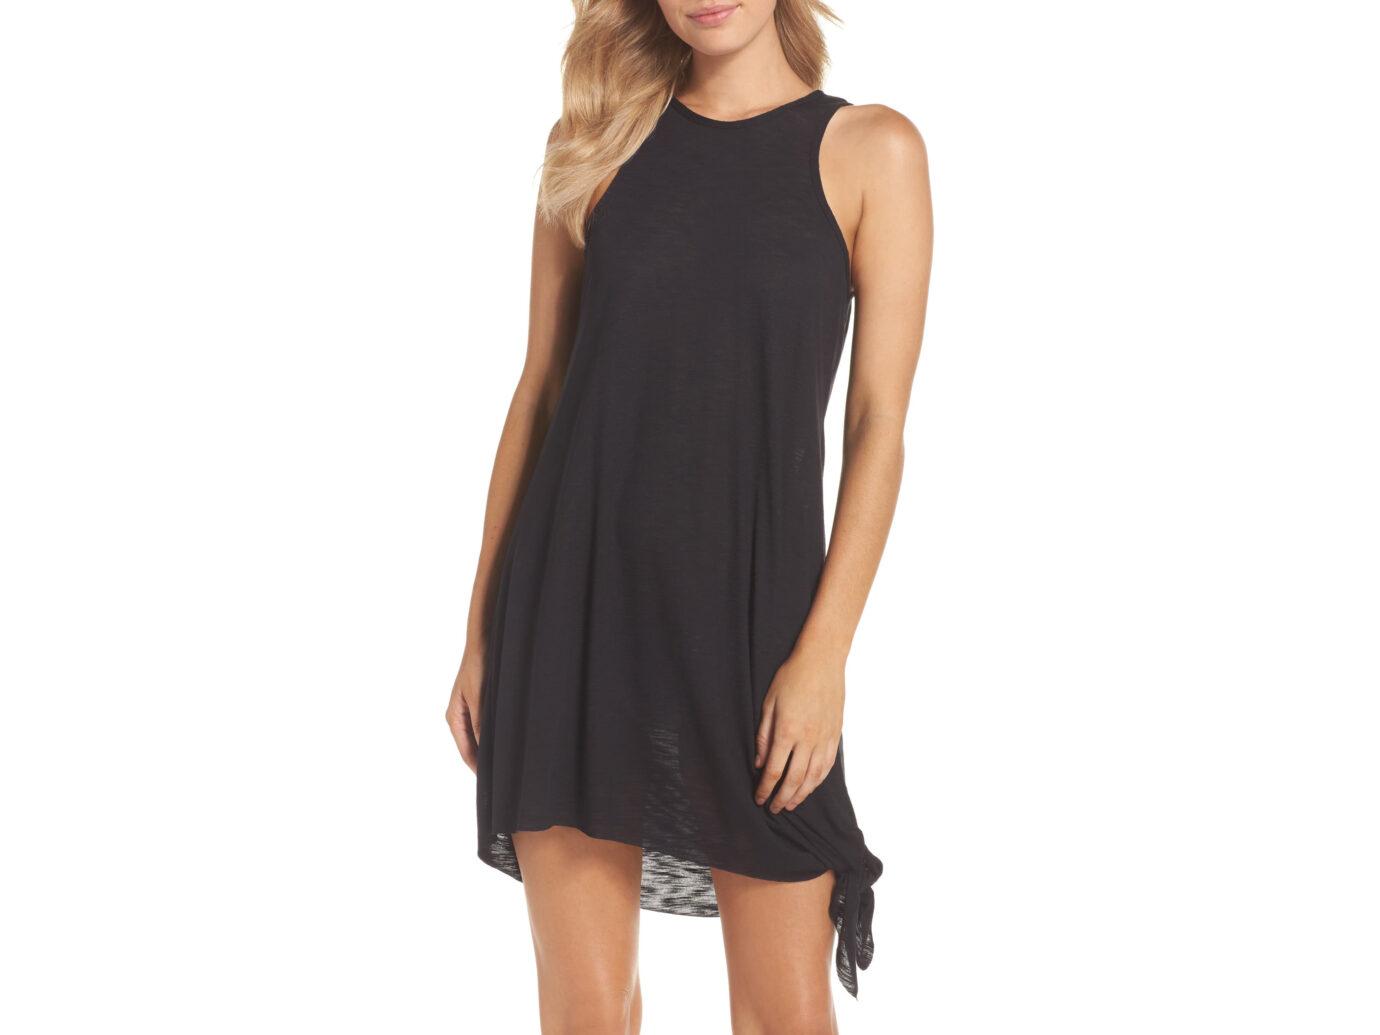 Becca Breezy Basics Cover-Up Dress